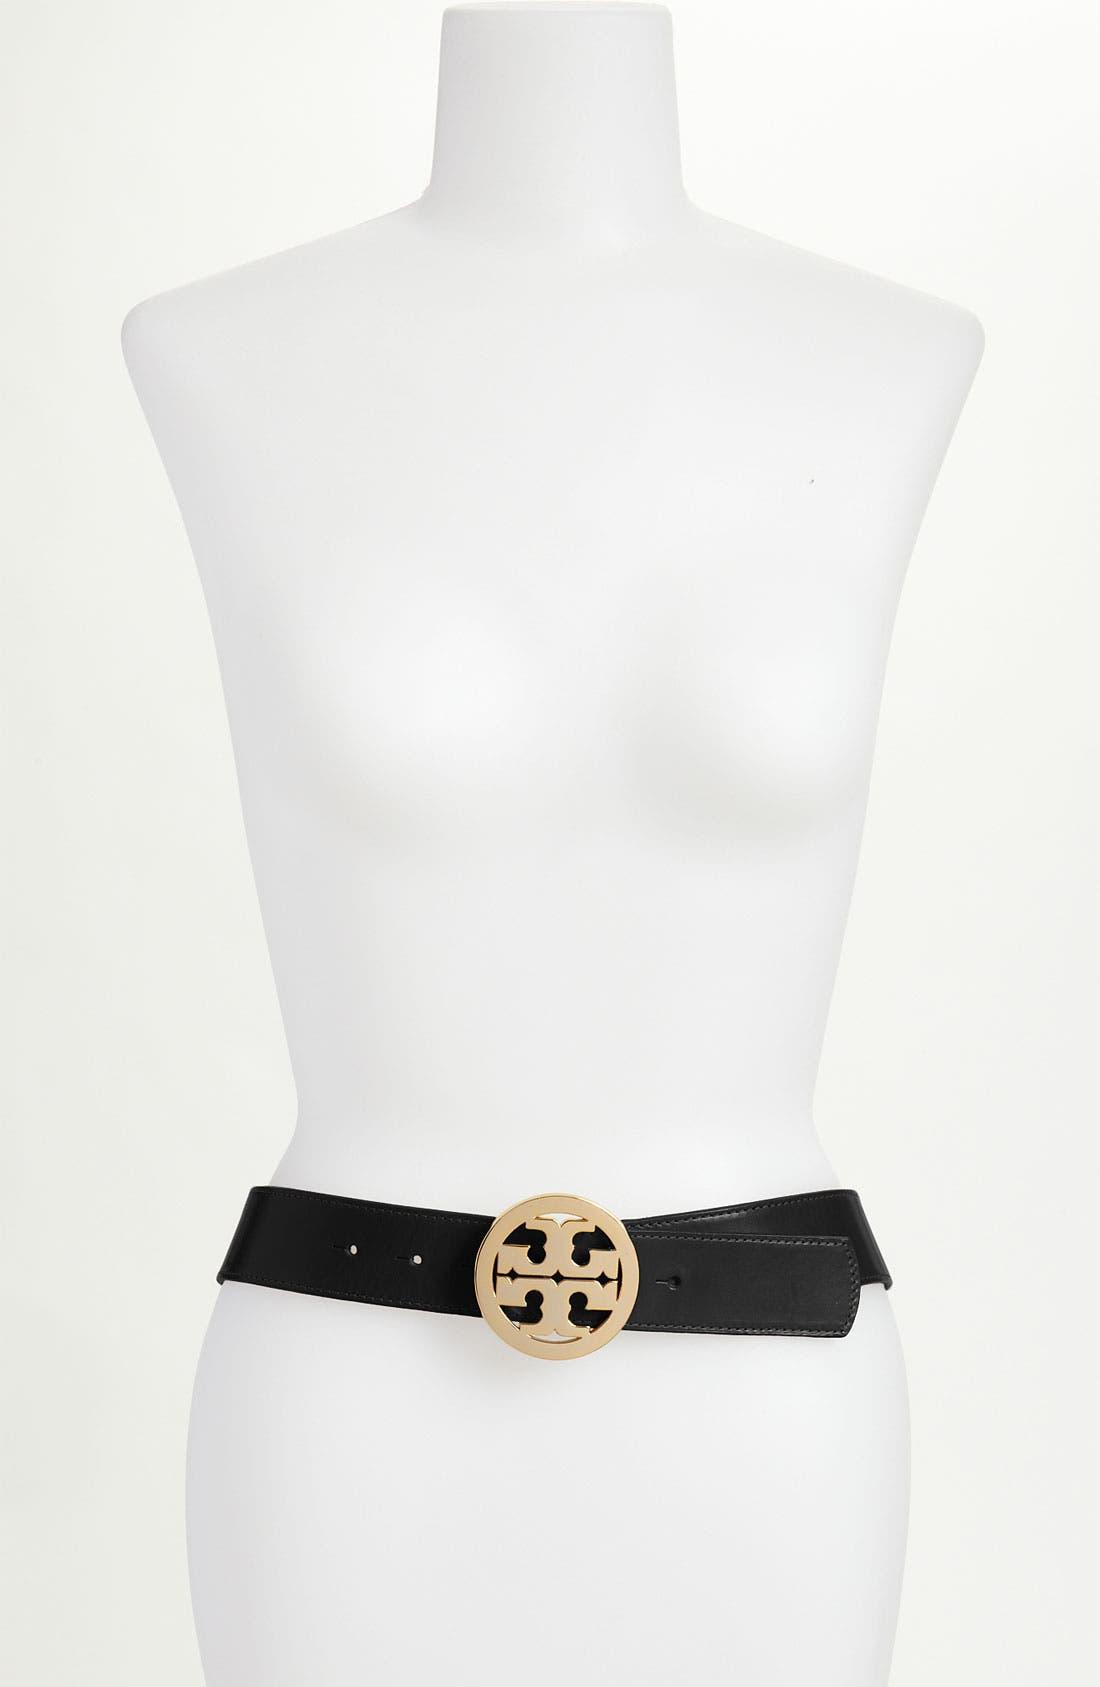 Main Image - Tory Burch 'Logo' Glazed Leather Belt